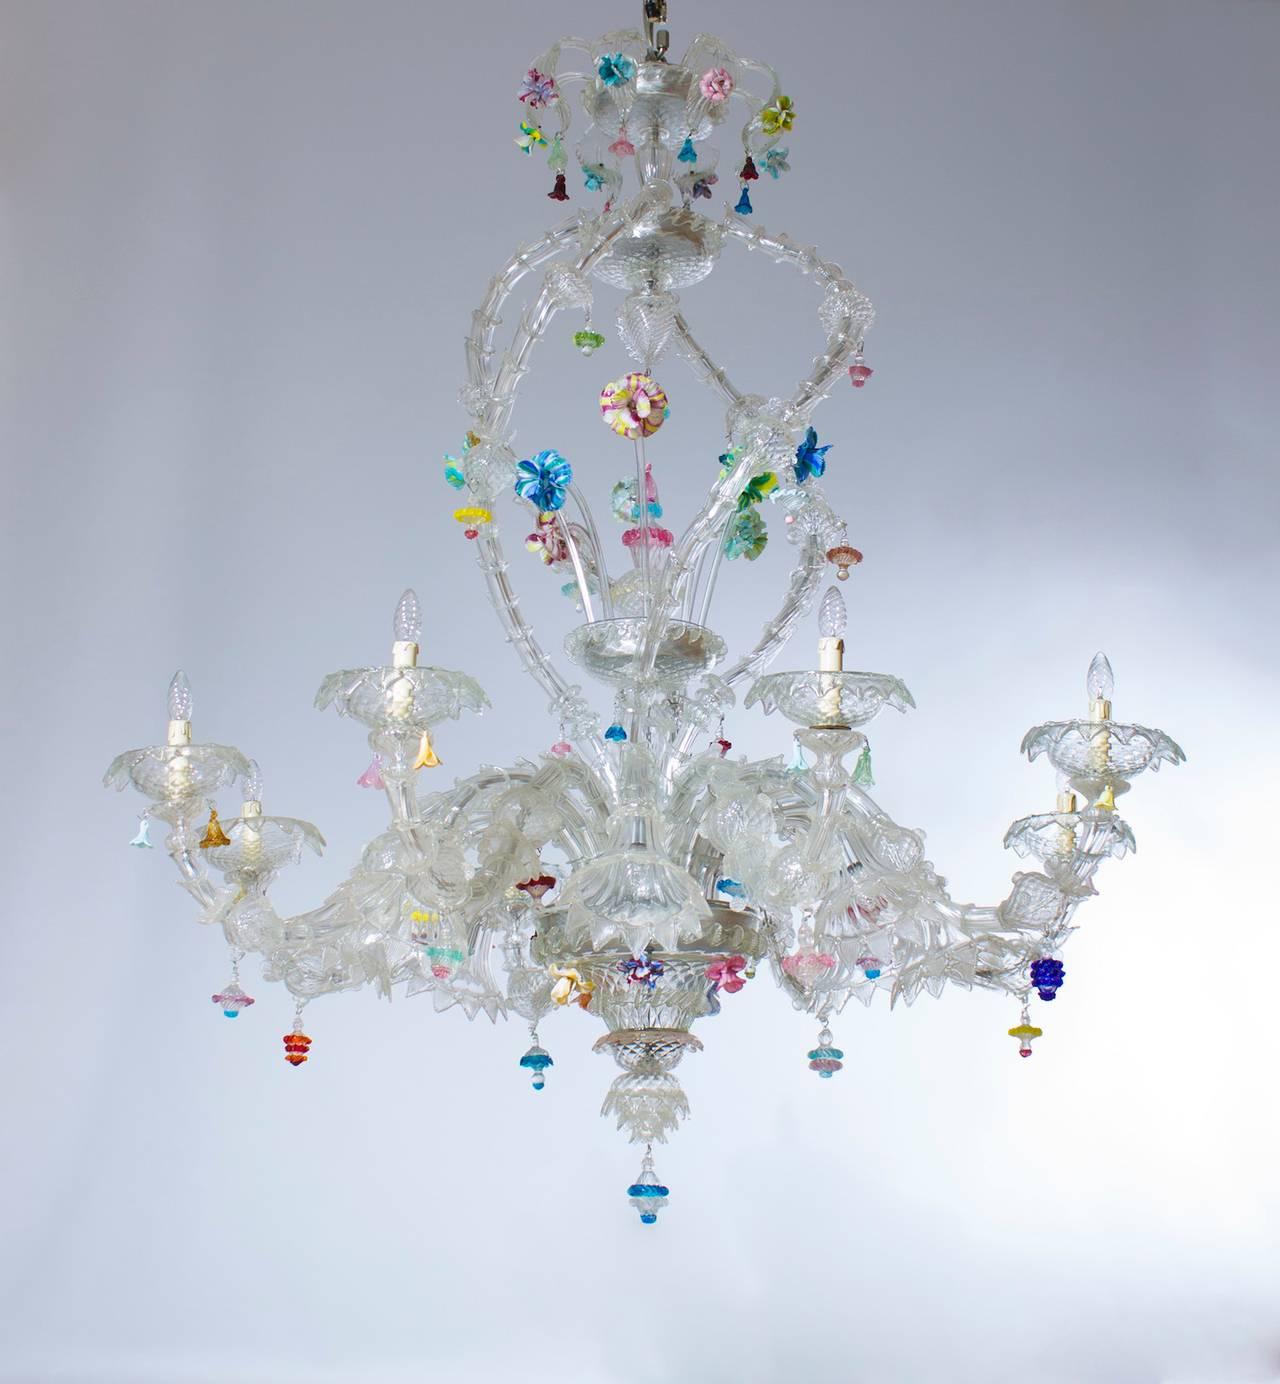 Italian Venetian Ca'rezzonico Chandelier, Blown Murano Glass, Seguso, 1950s For Sale 3